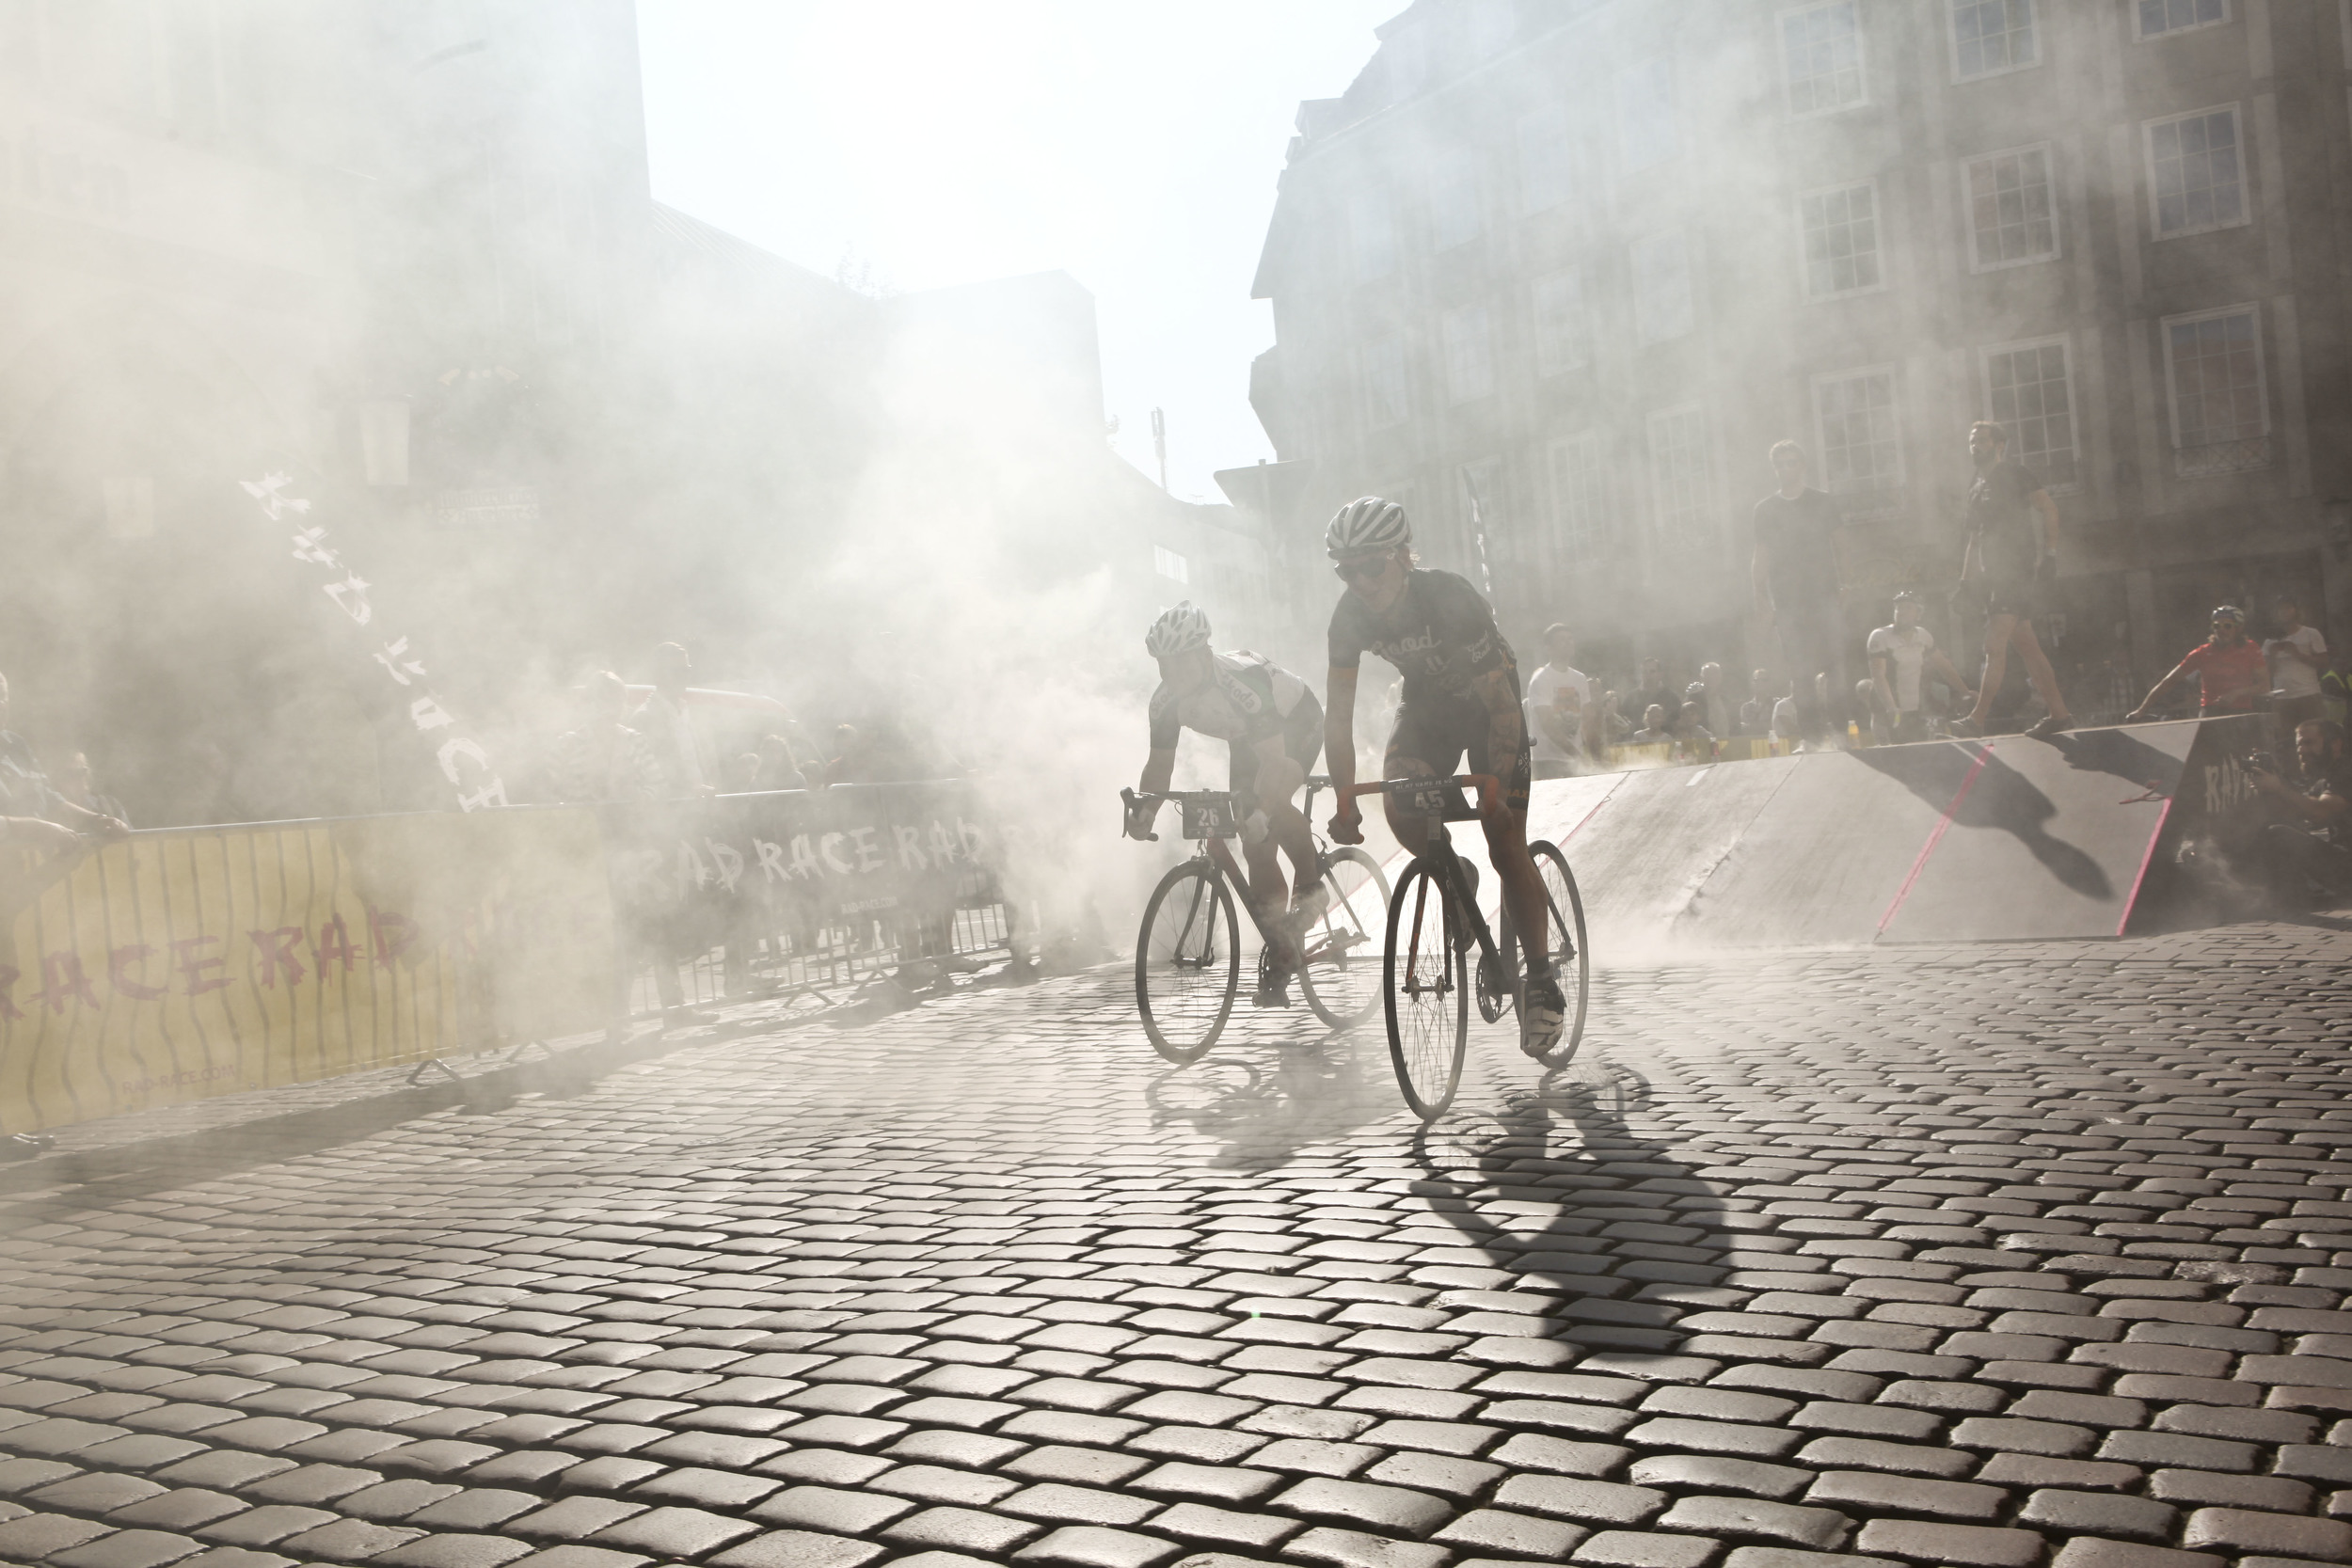 RAD RACE BATTLE Münster 2014 Pic by Erol Taskoparan_21.jpg